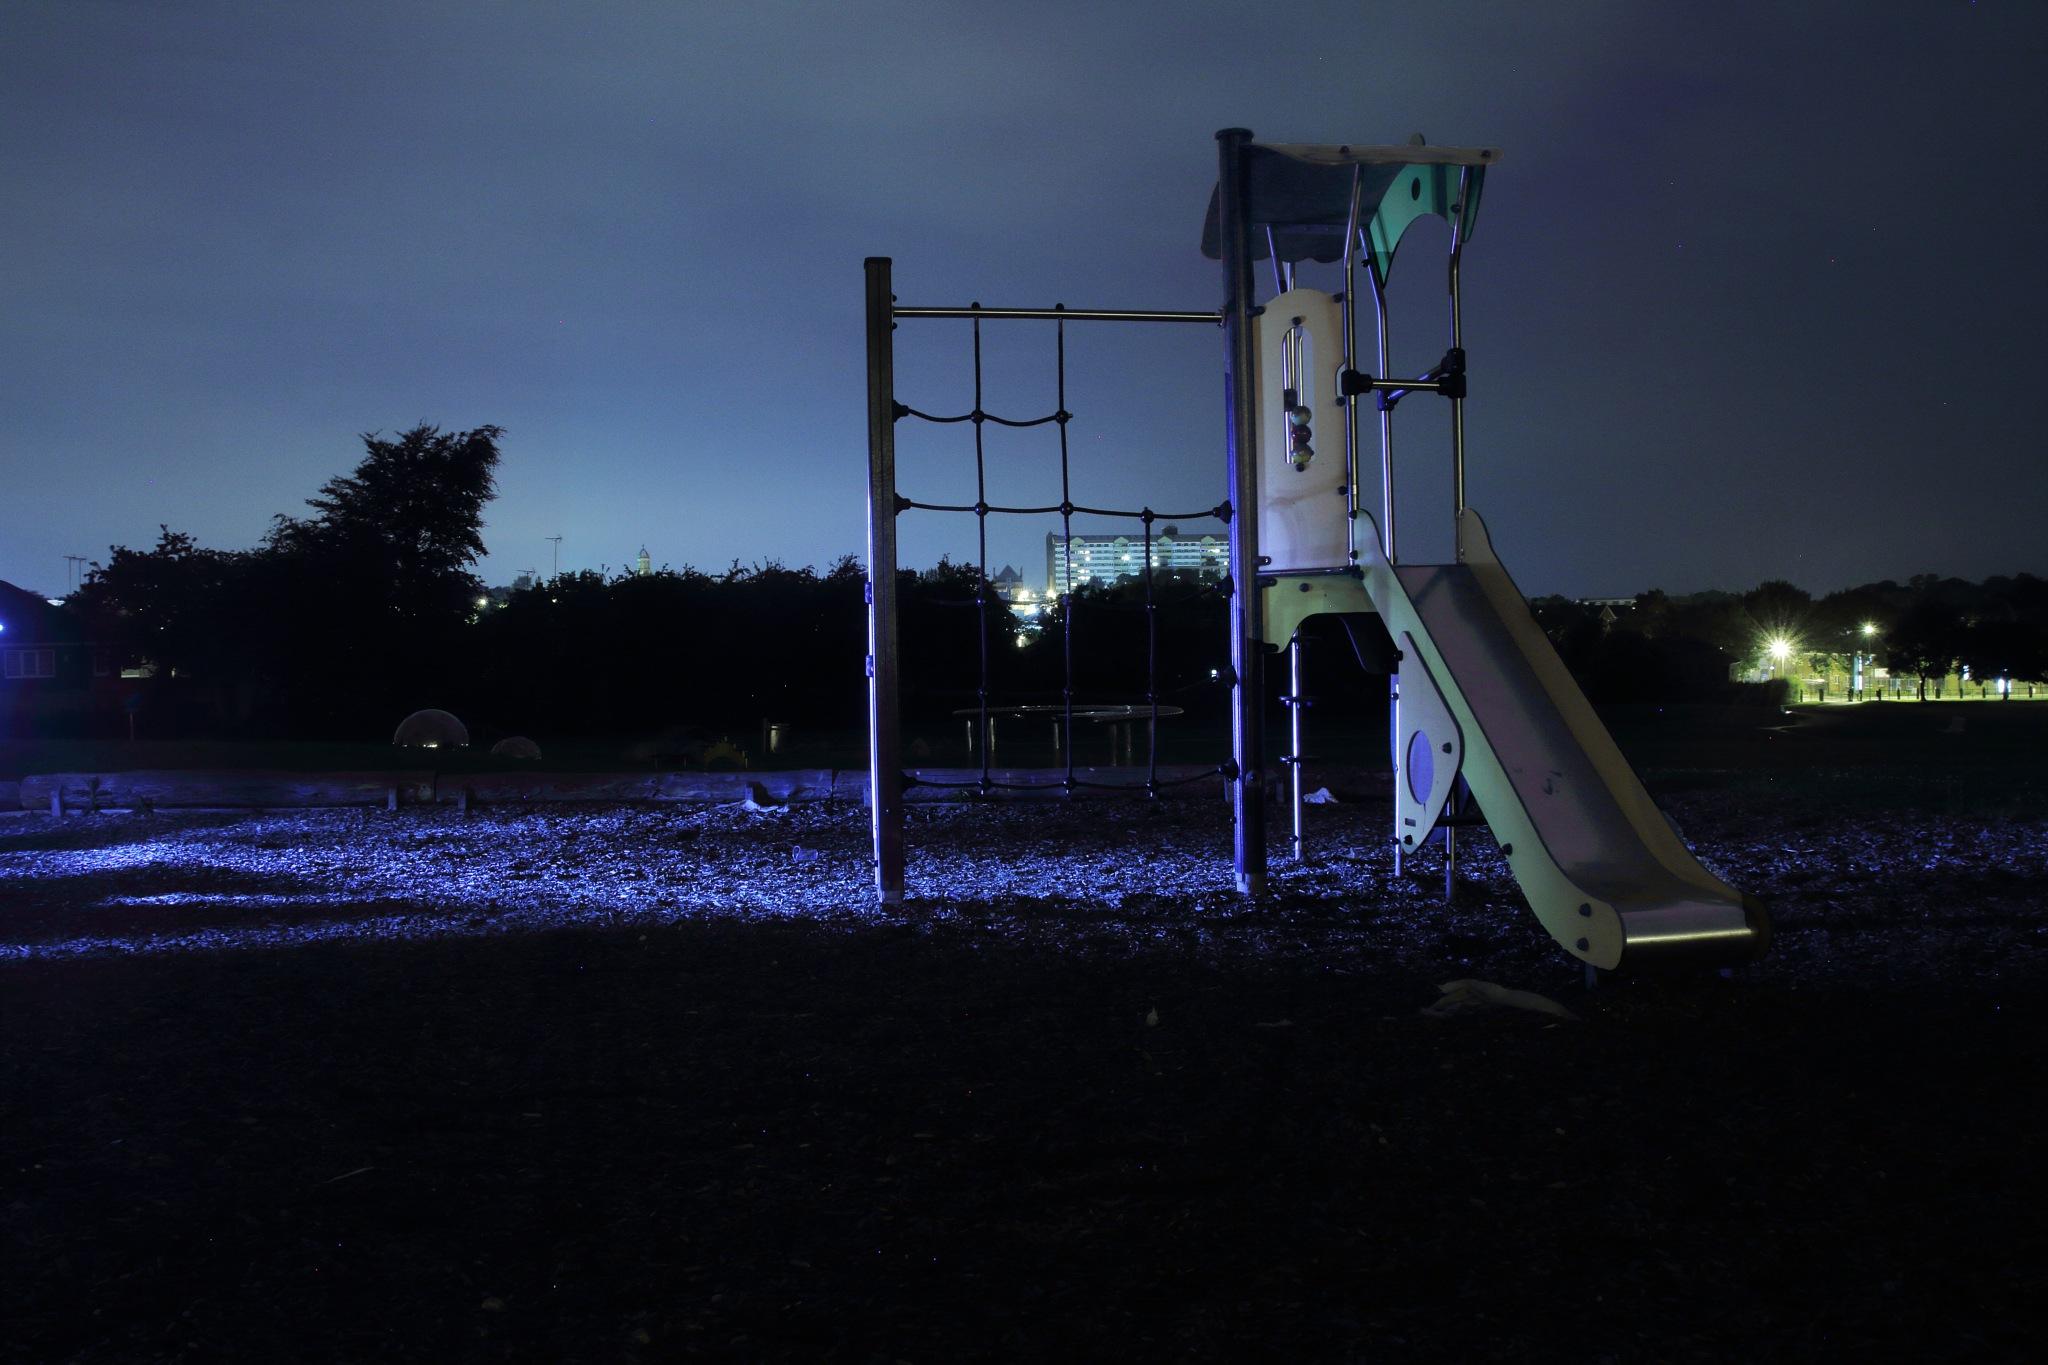 climbing frame by Jason Lavine